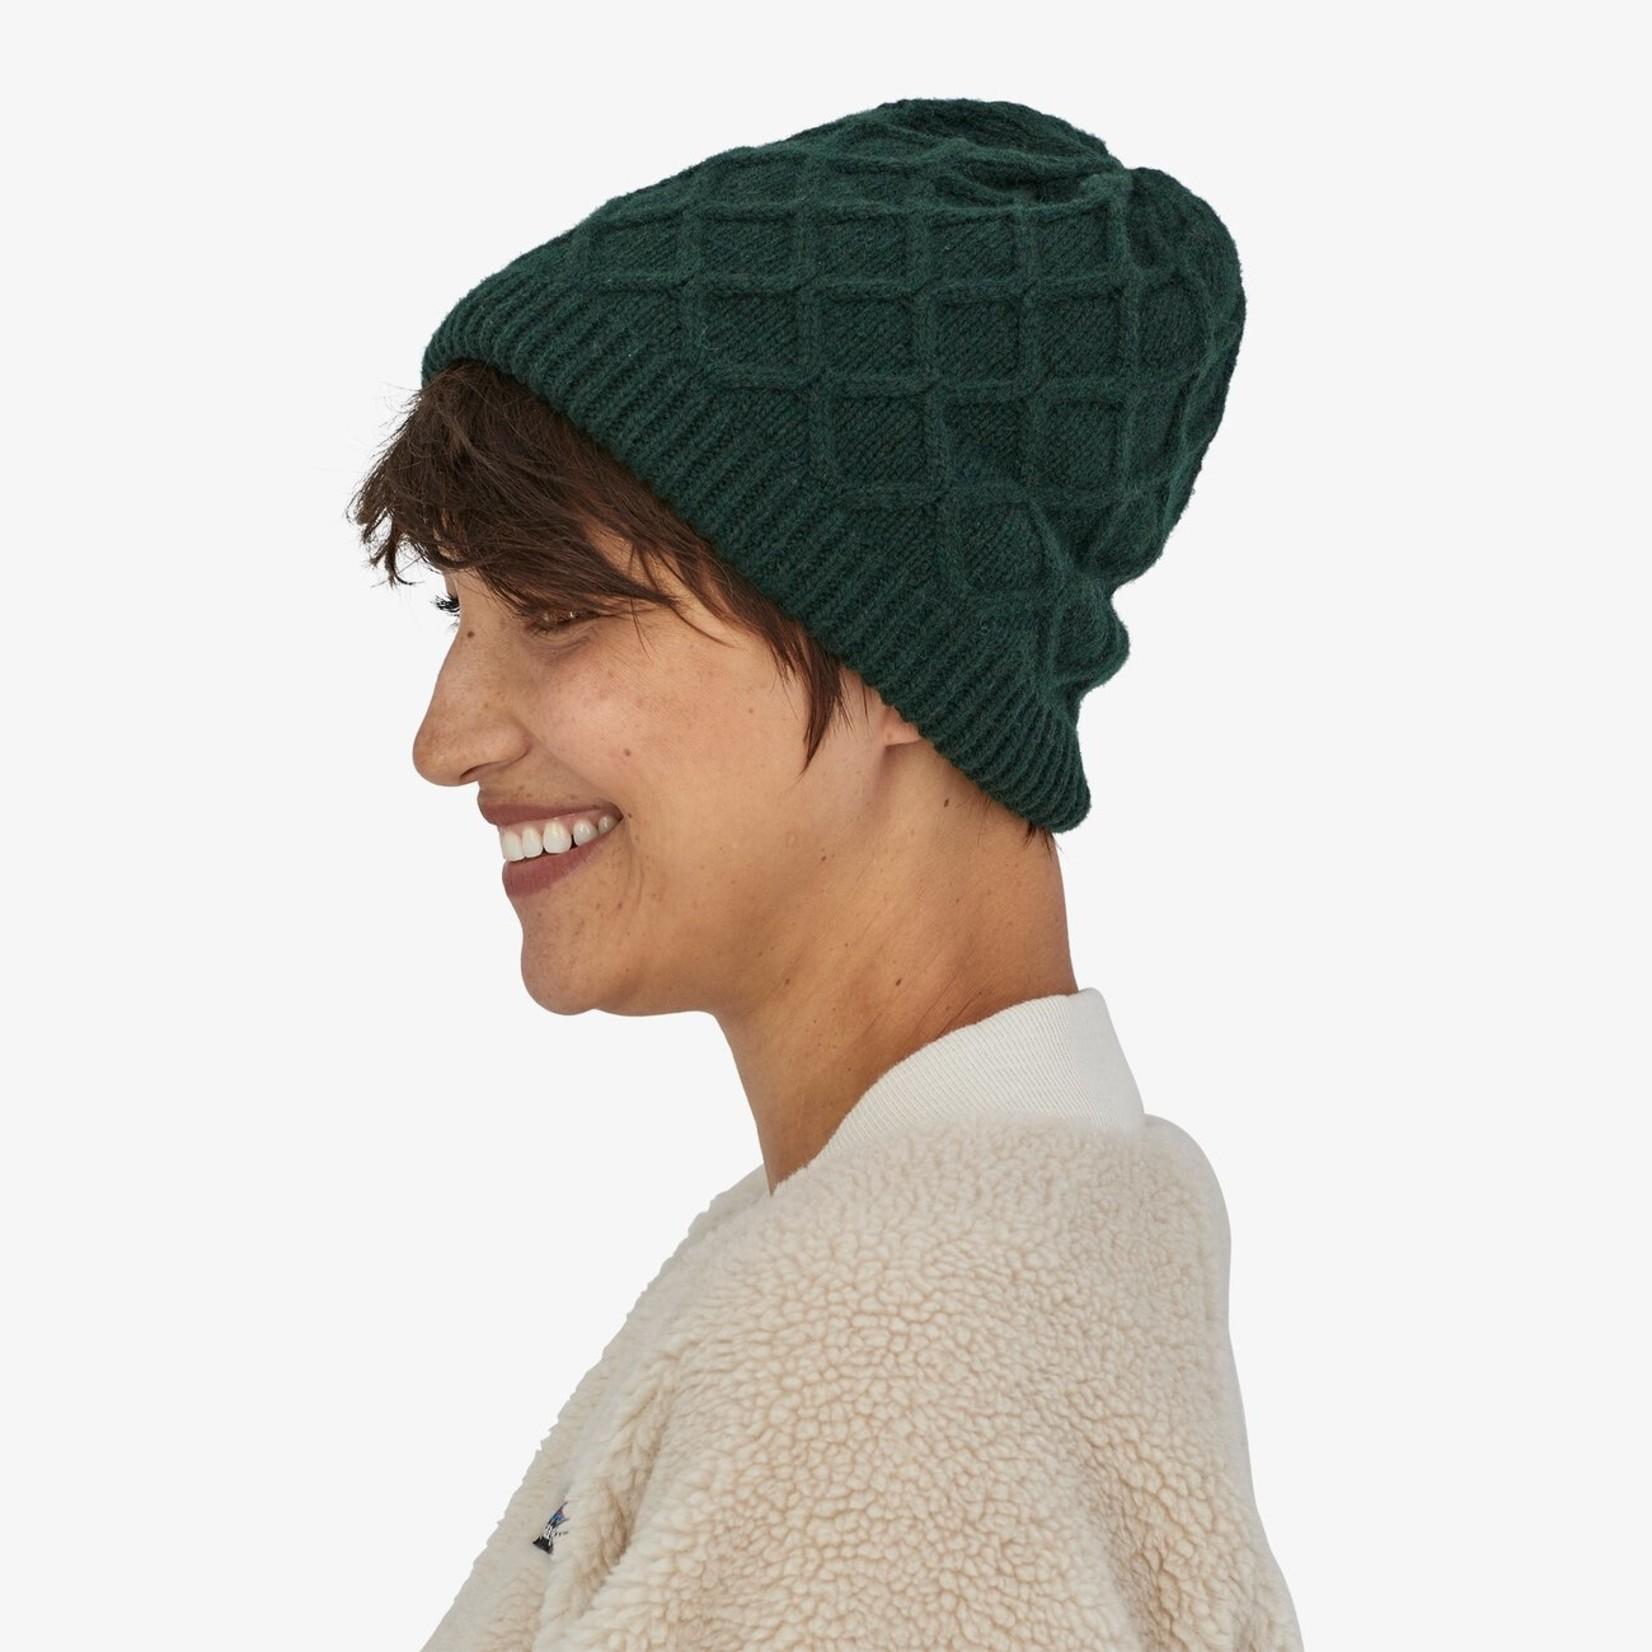 Patagonia Patagonia Women's Honeycomb Knit Beanie